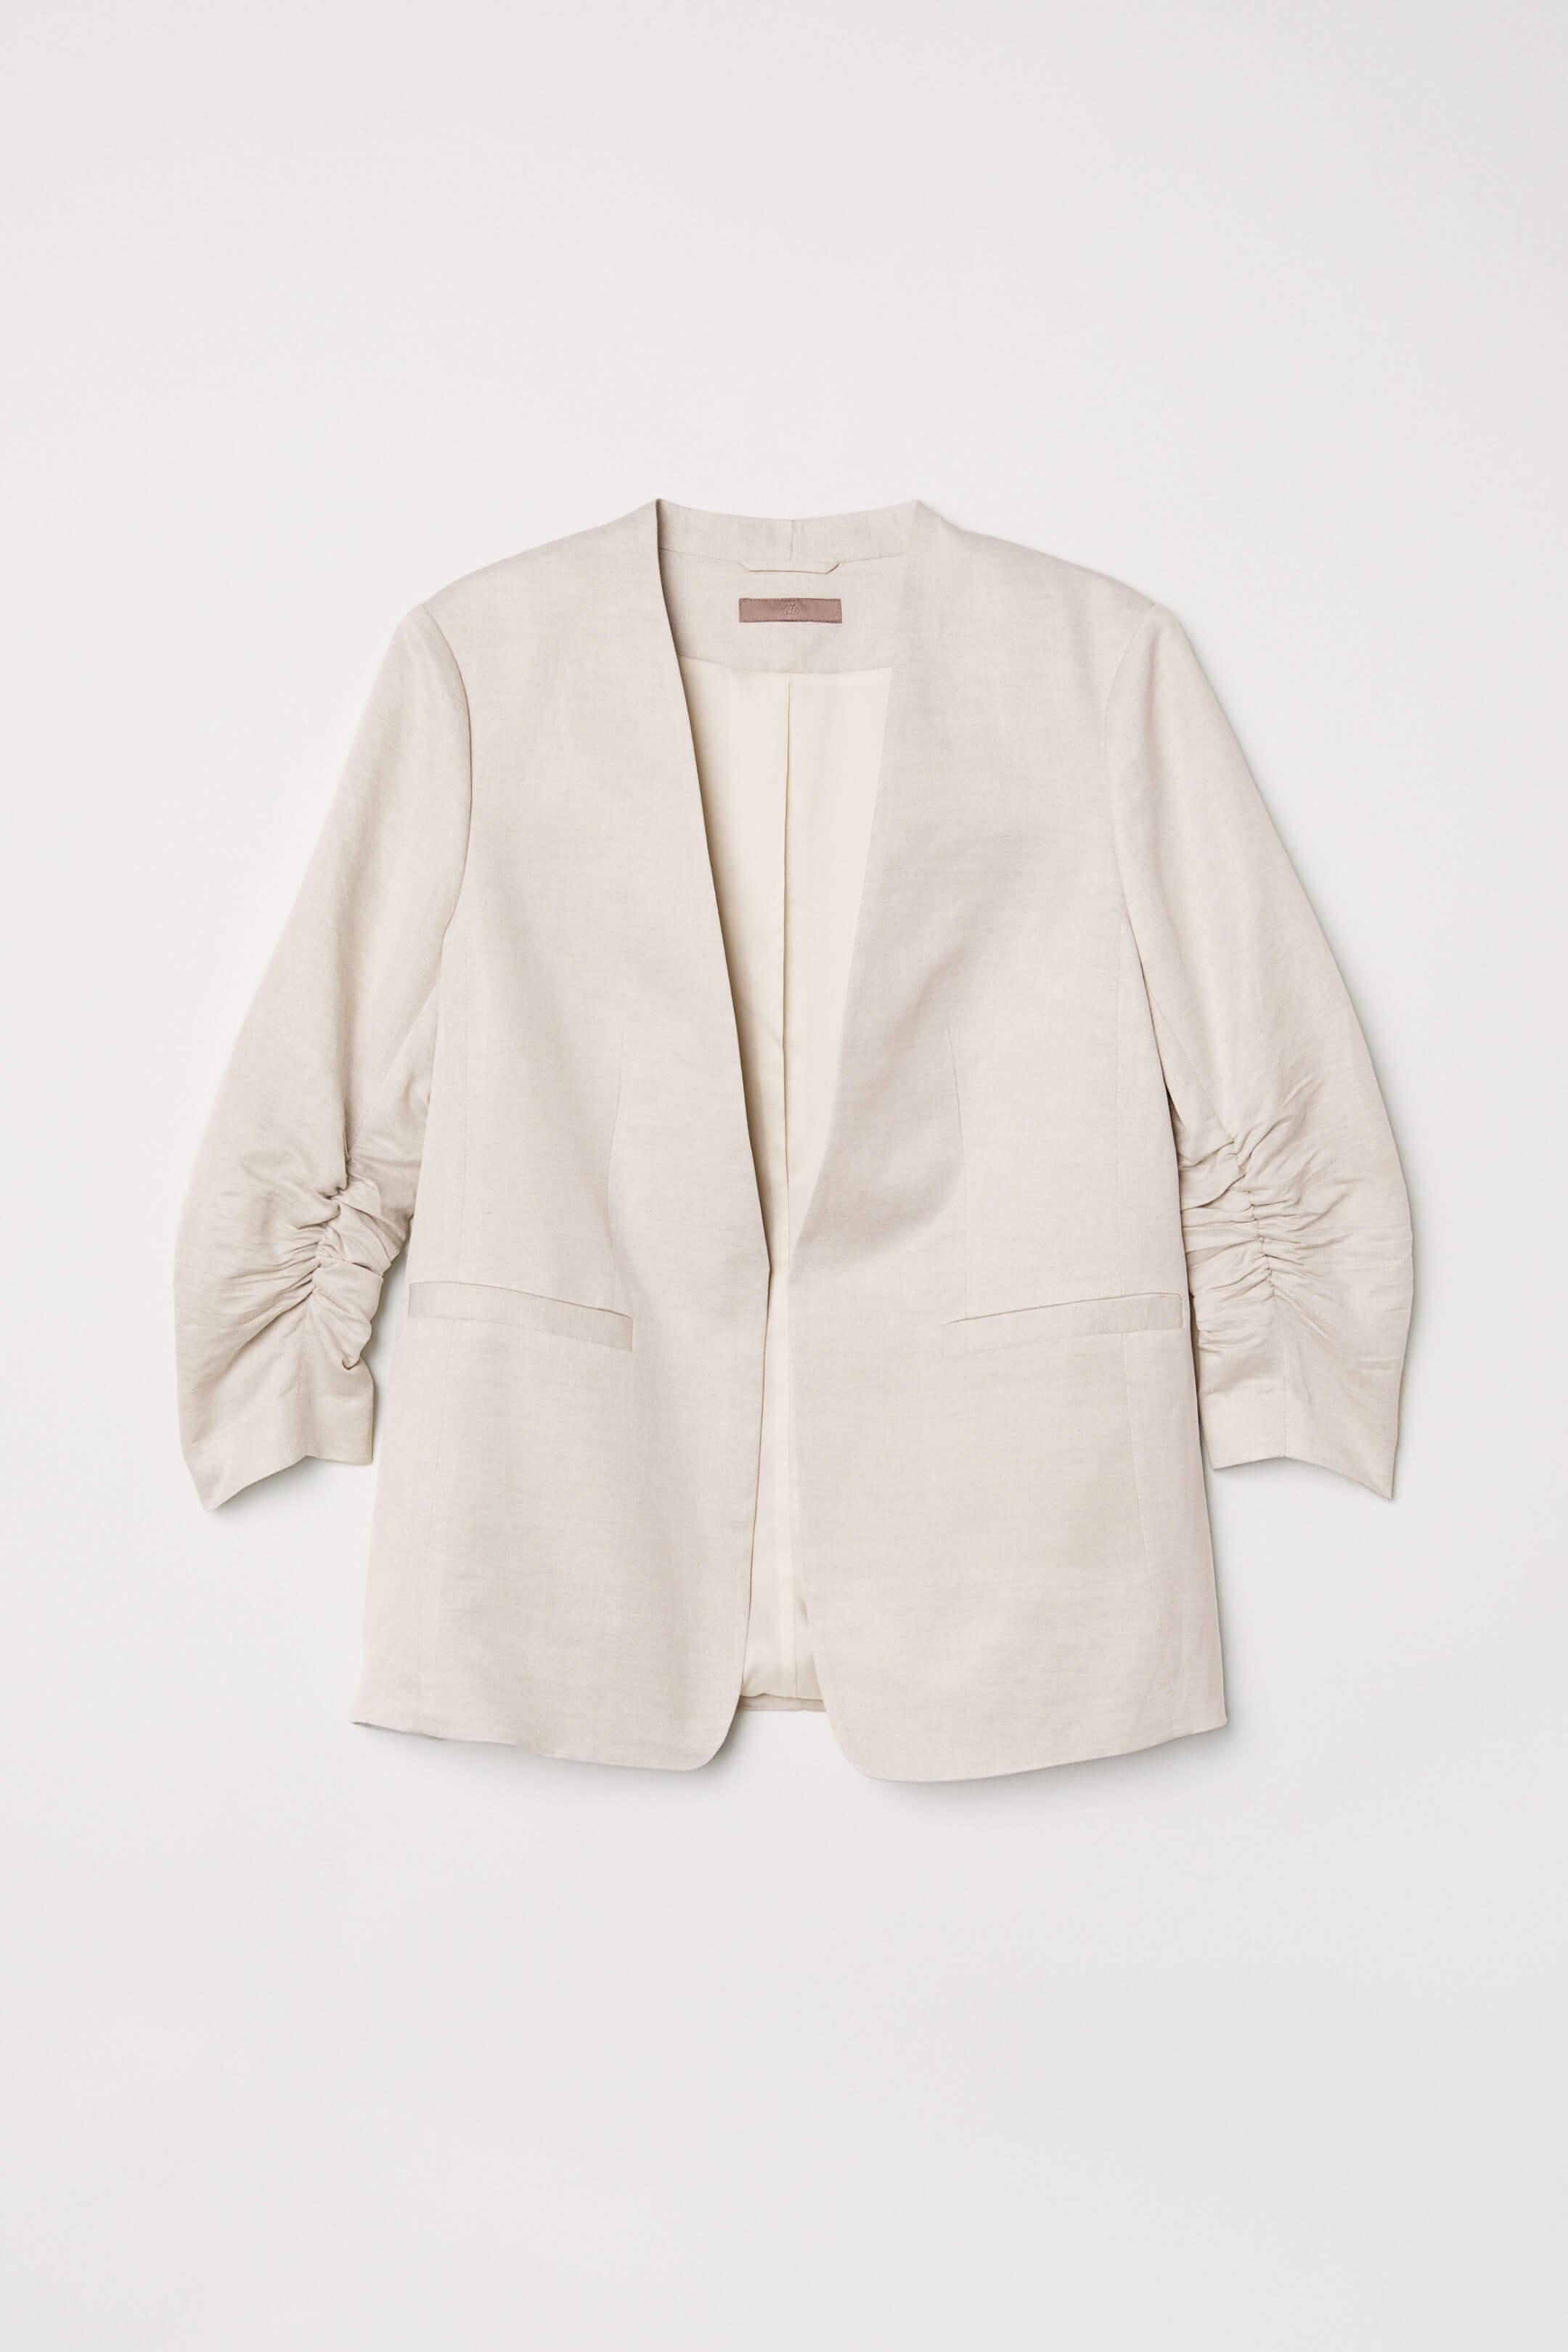 Americana de lino blanco, H&M